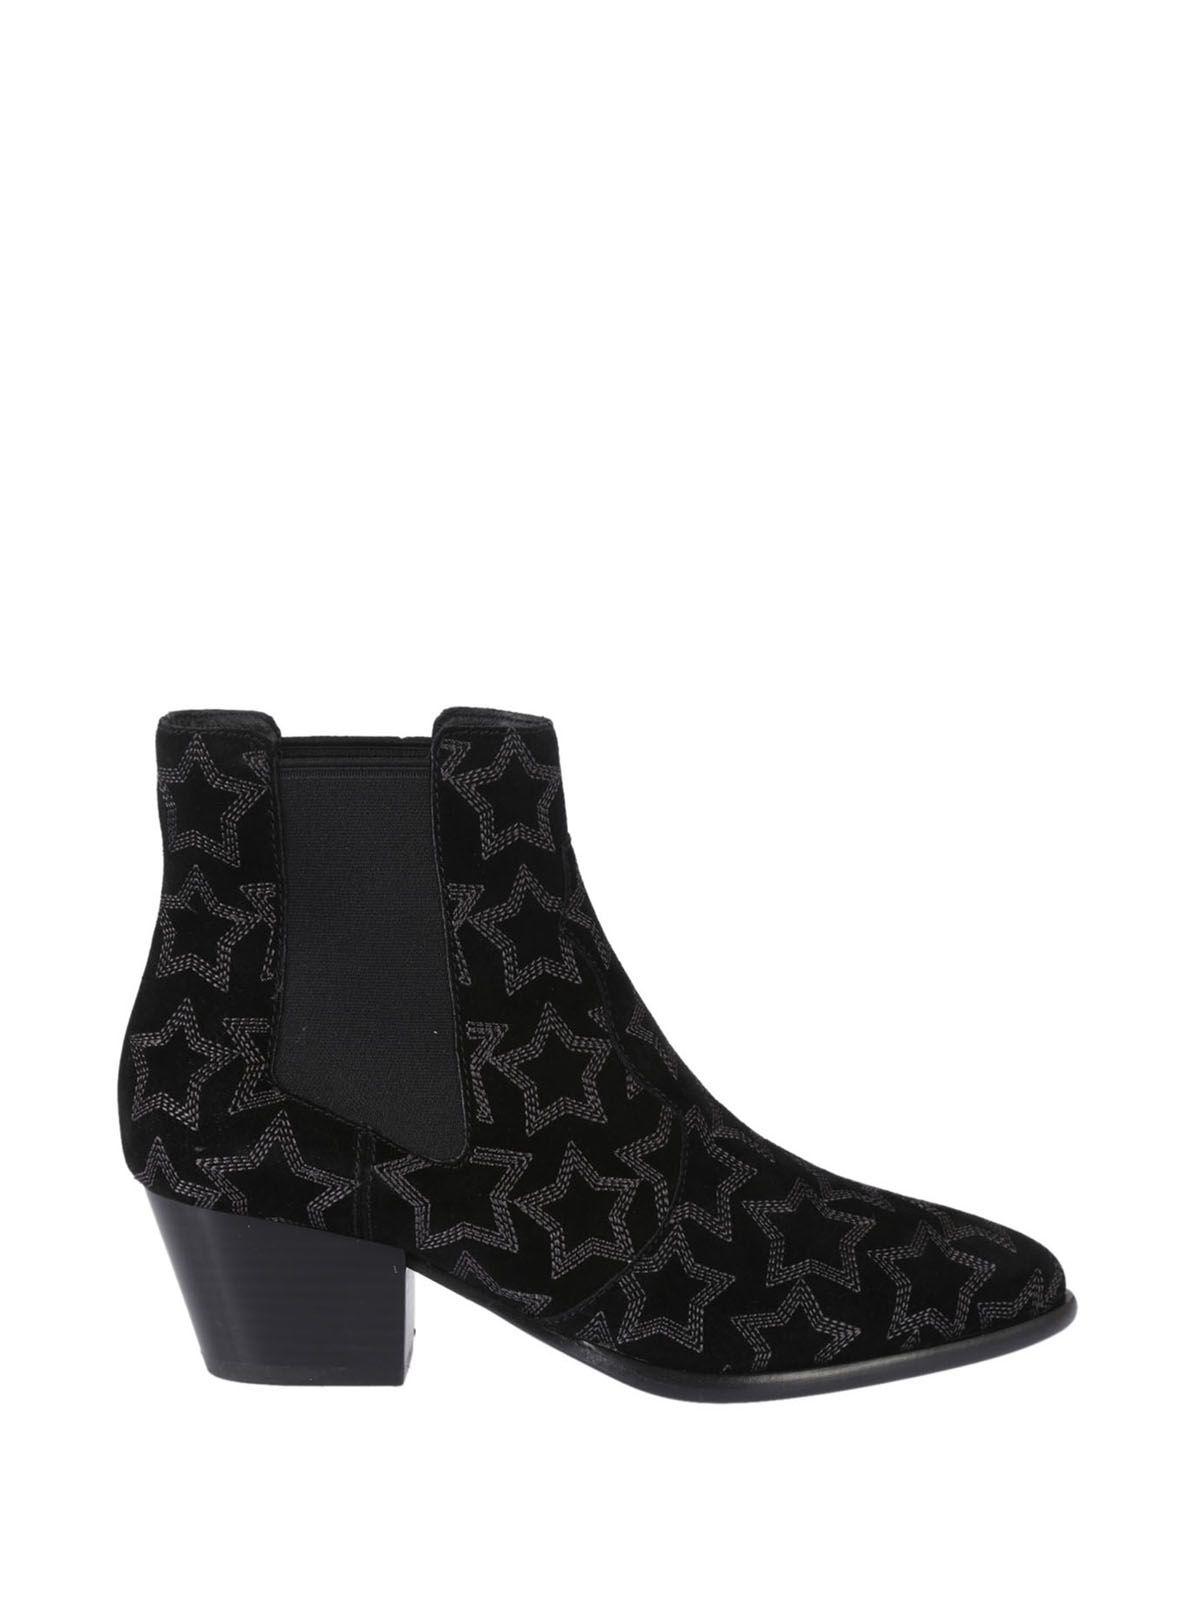 Ash Hopestar Ankle Boots